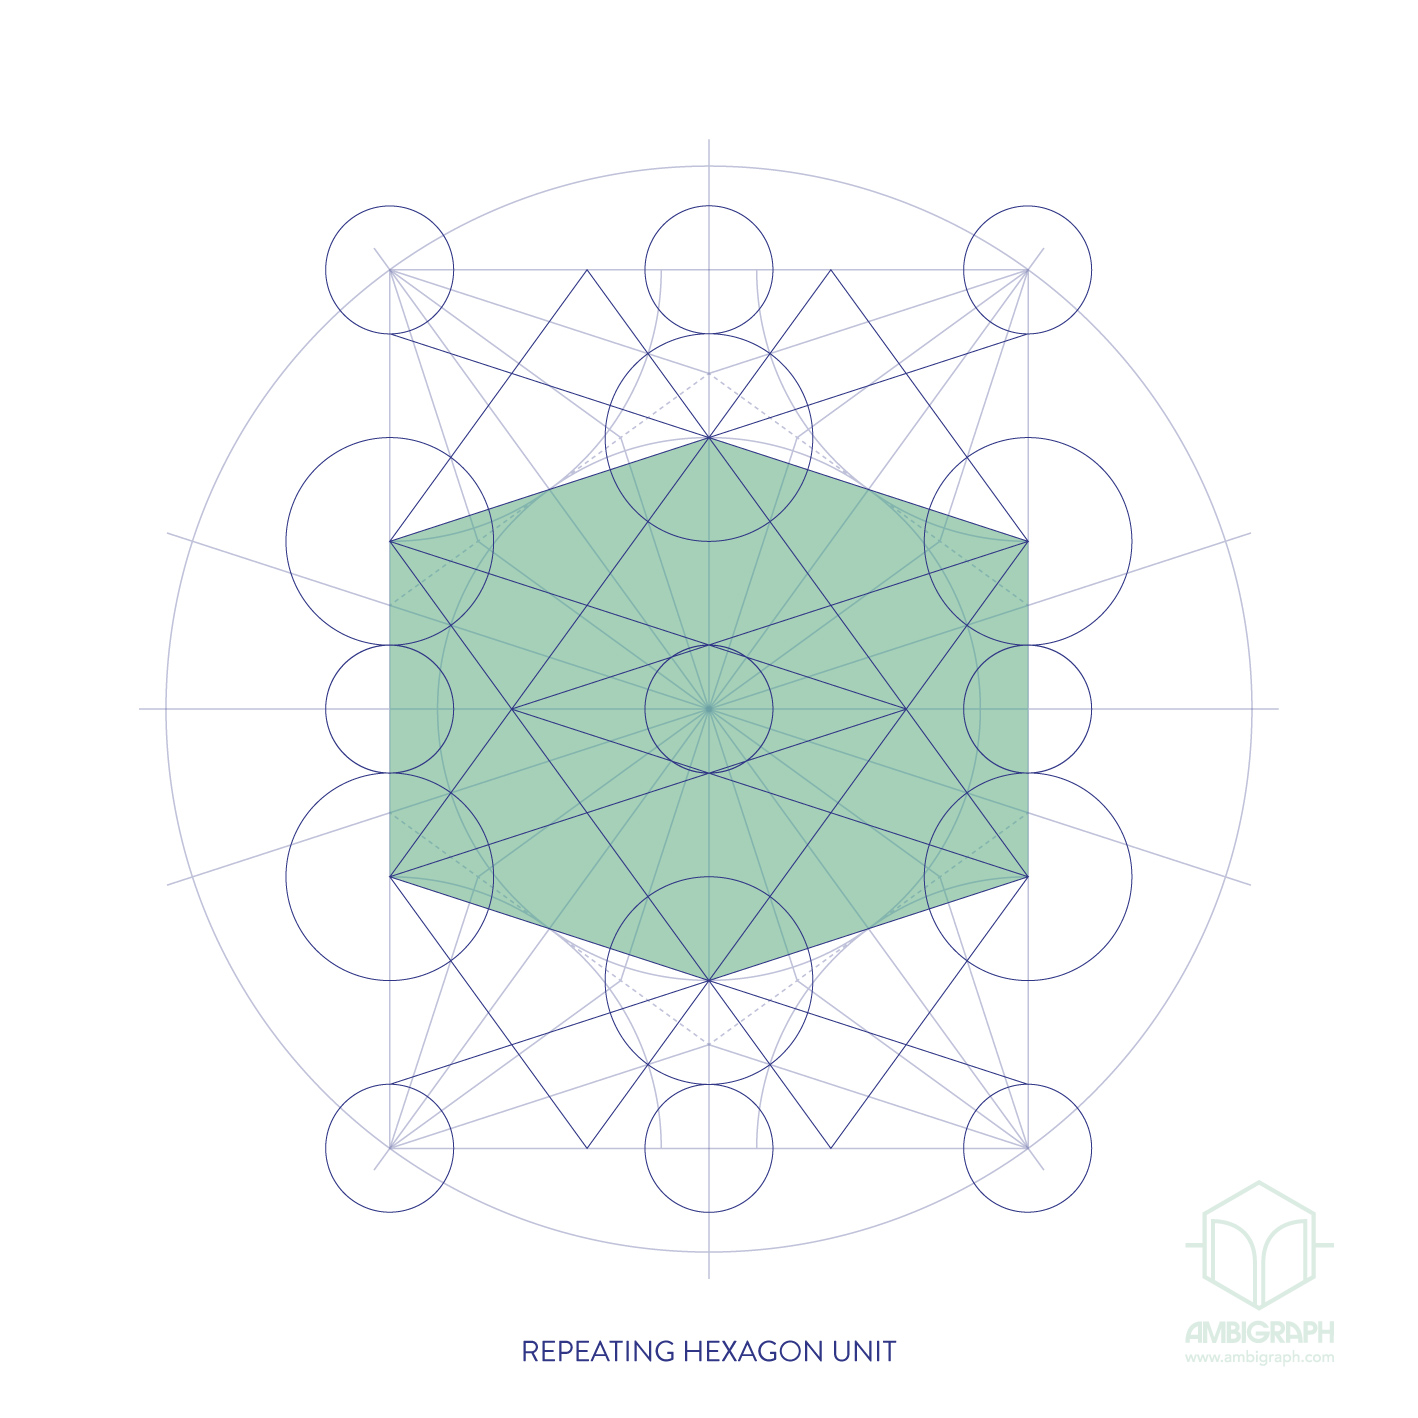 tenfold hexagon repeat R&C-01f